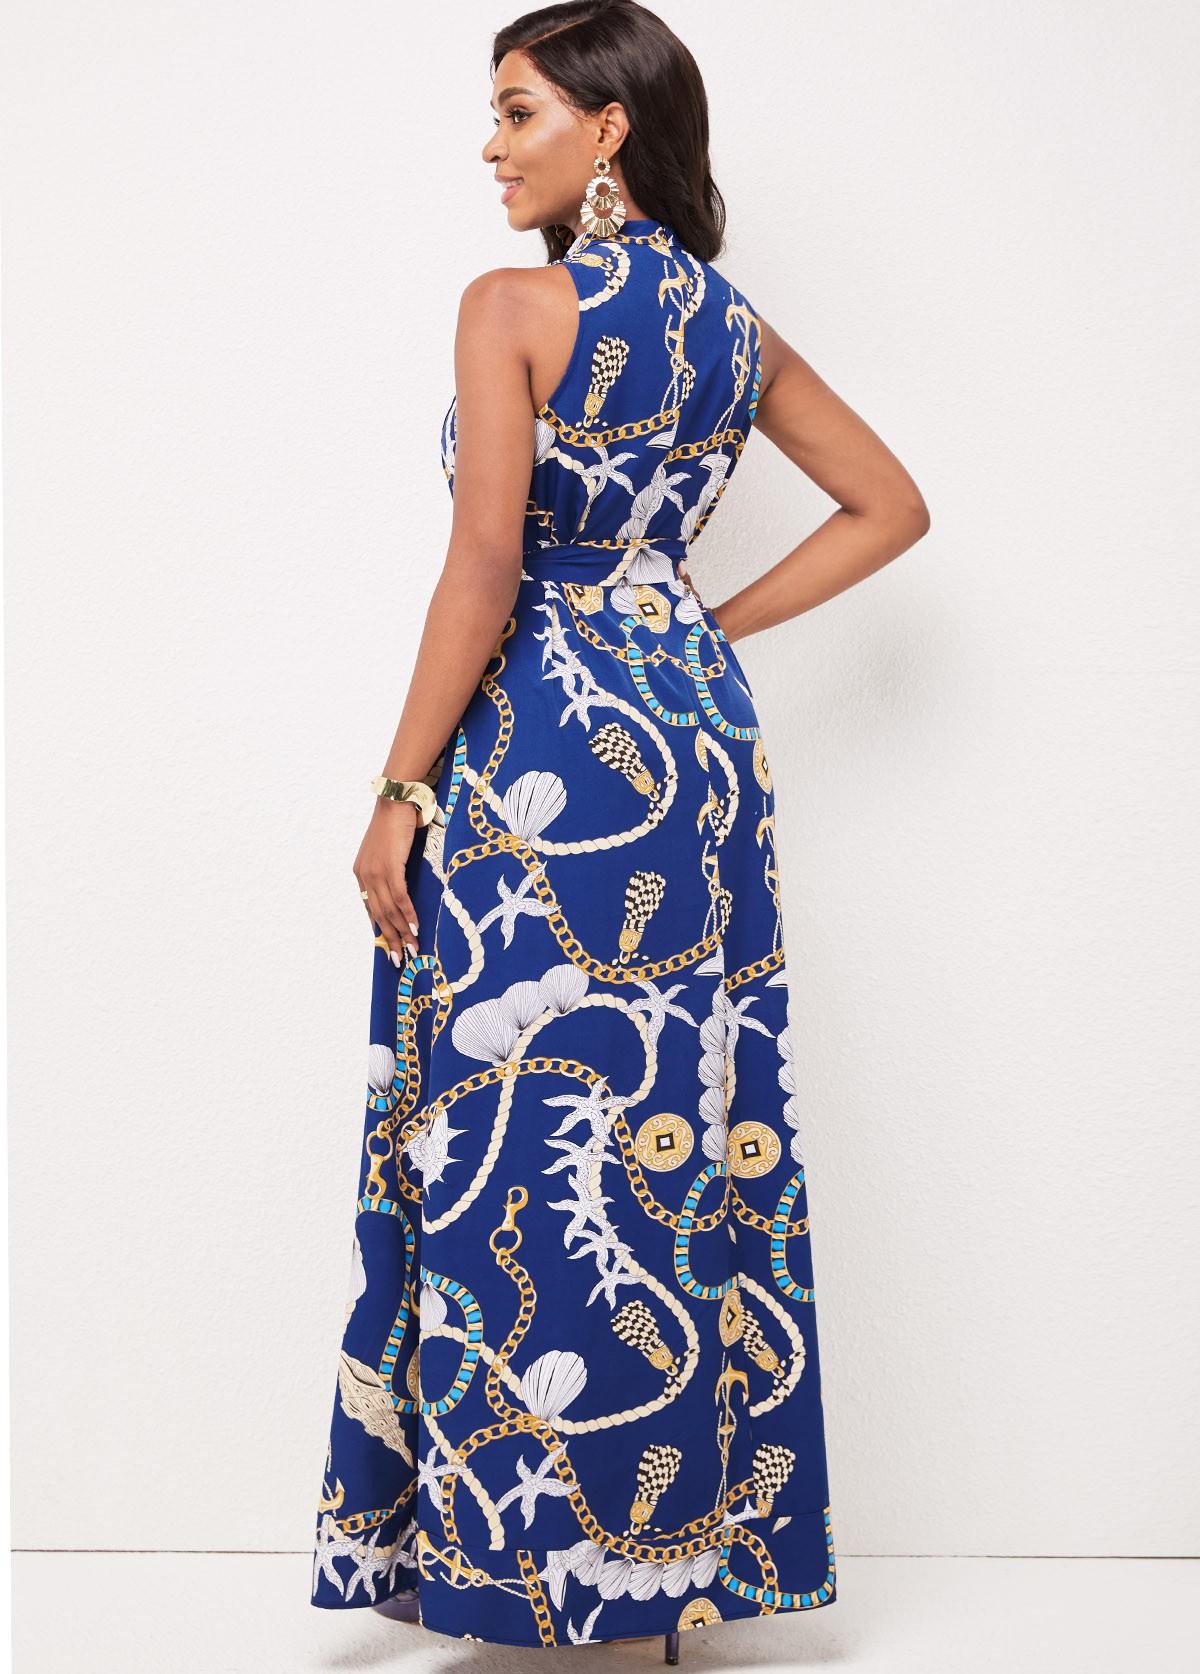 Sleeveless Gold Chain Print Pocket Swing Dress